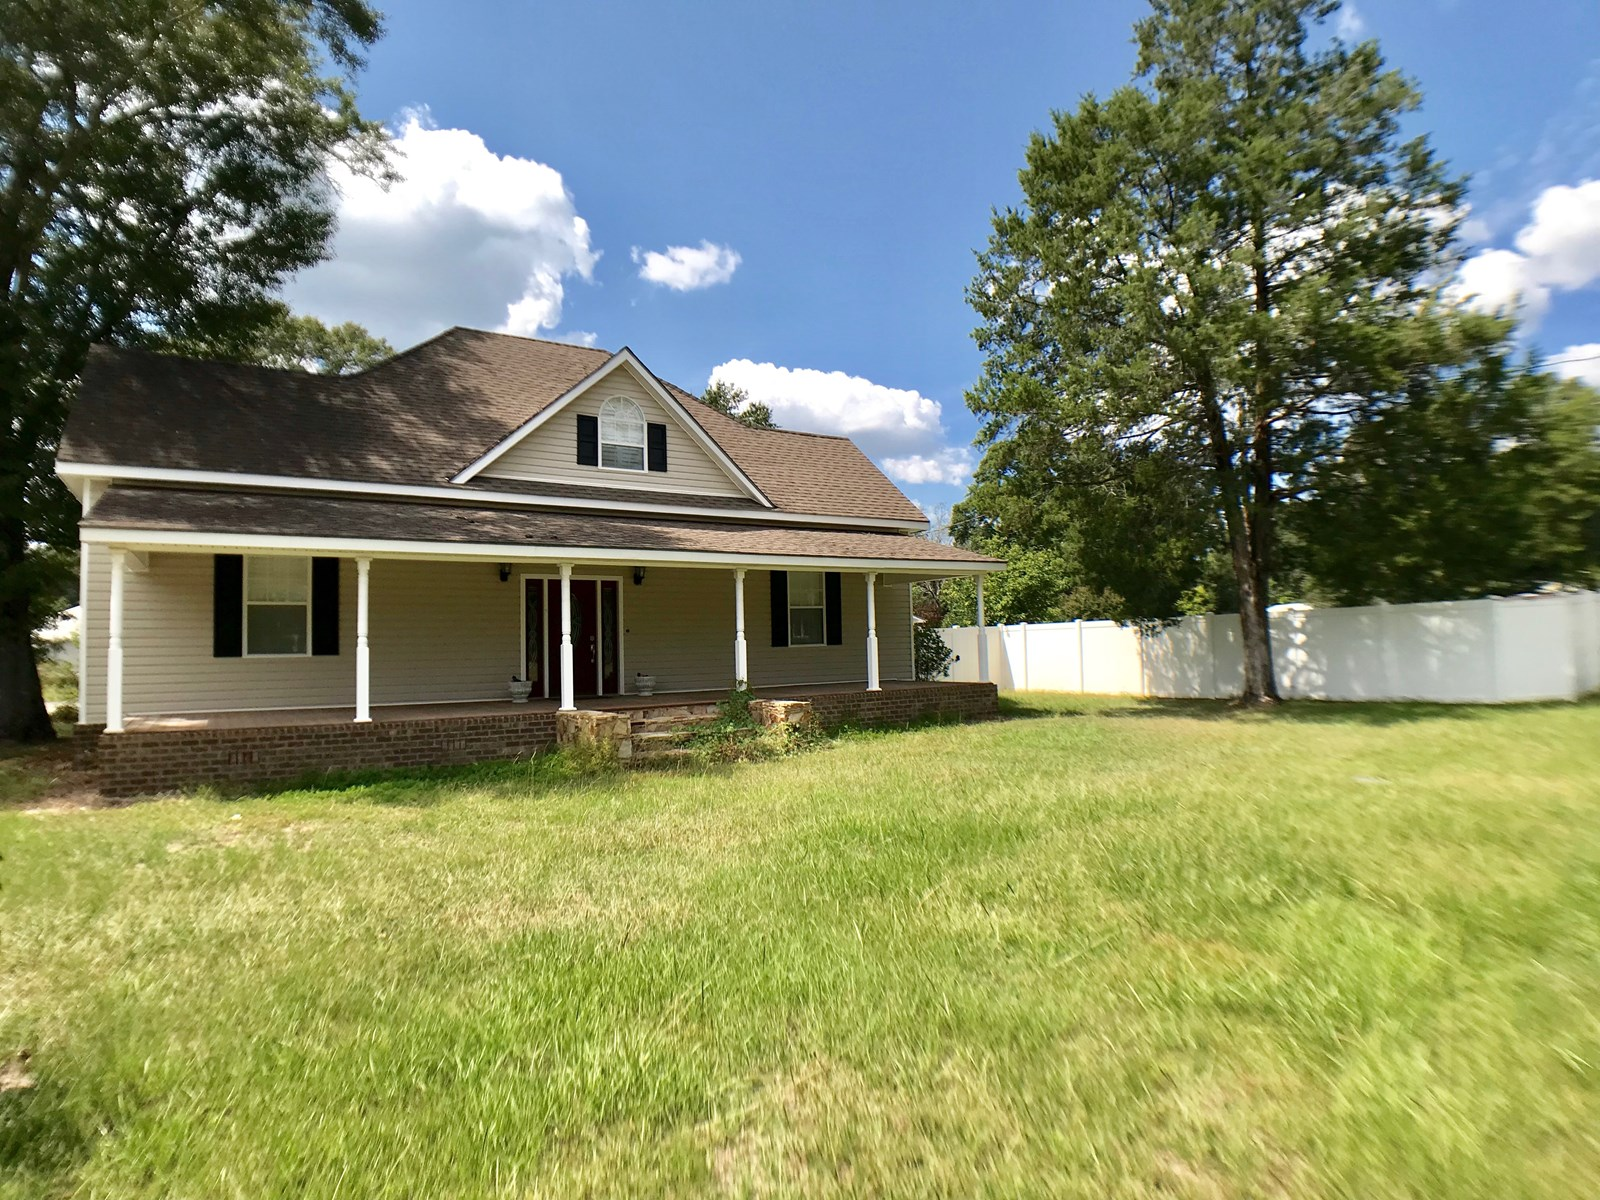 4B-4B Home for sale on Live Oak St, Geneva, Alabama